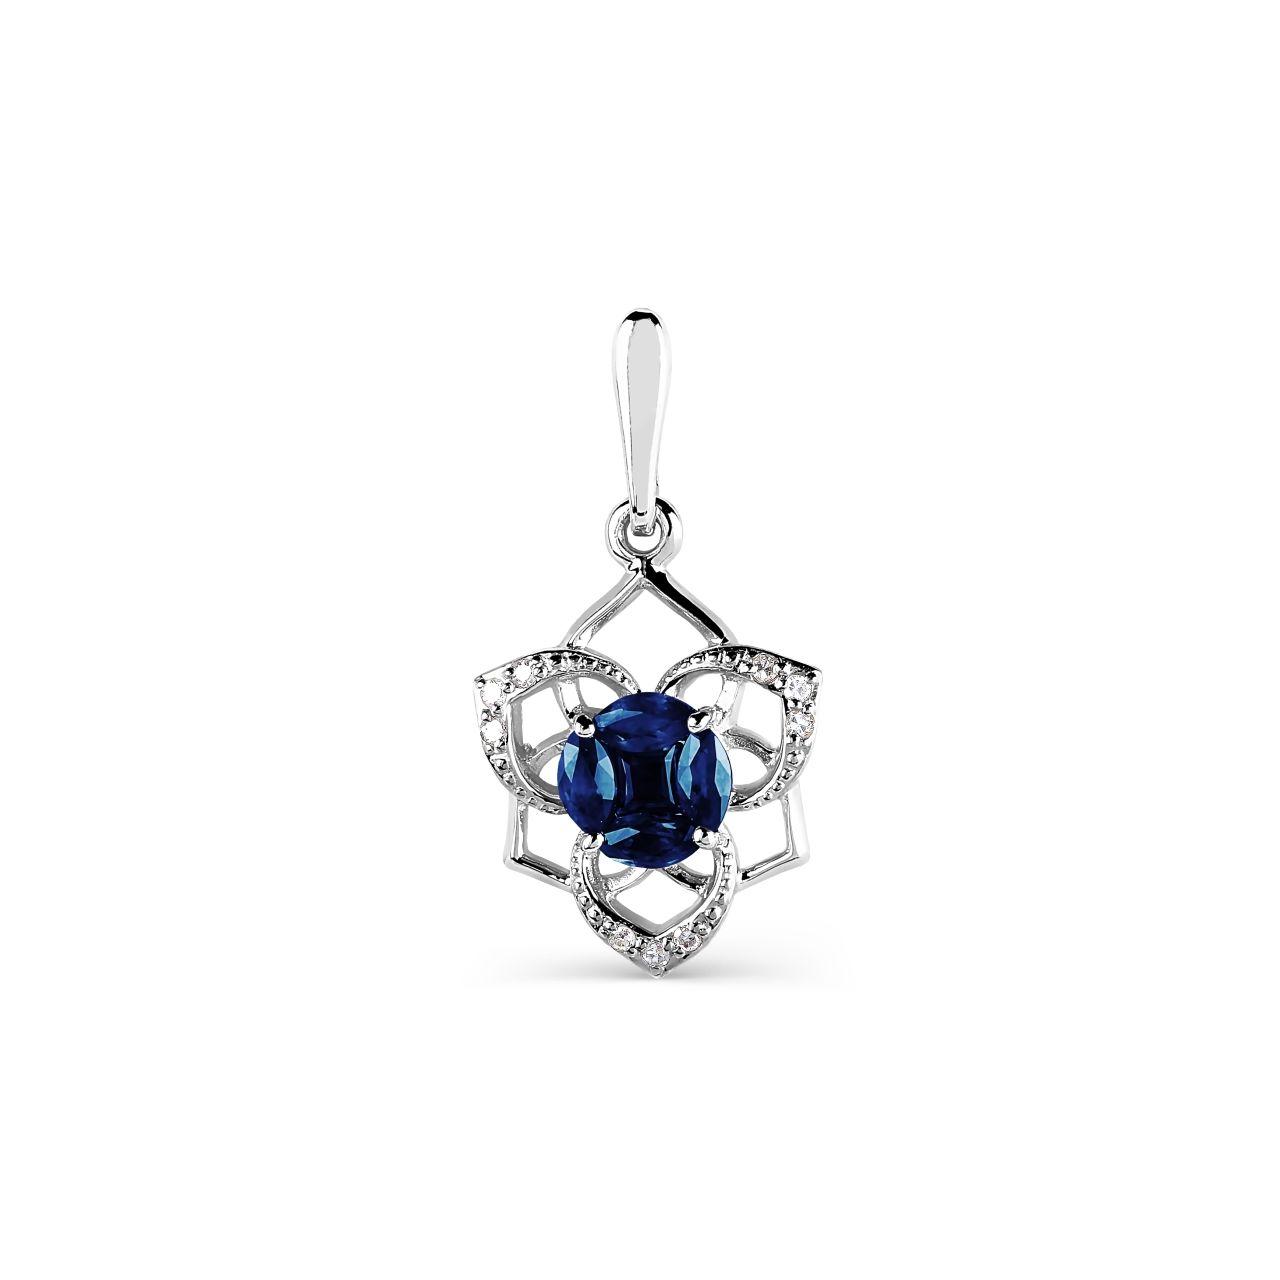 Goldsmithore diamond white gold pendant with sapphire diamond white gold pendant with sapphire aloadofball Image collections